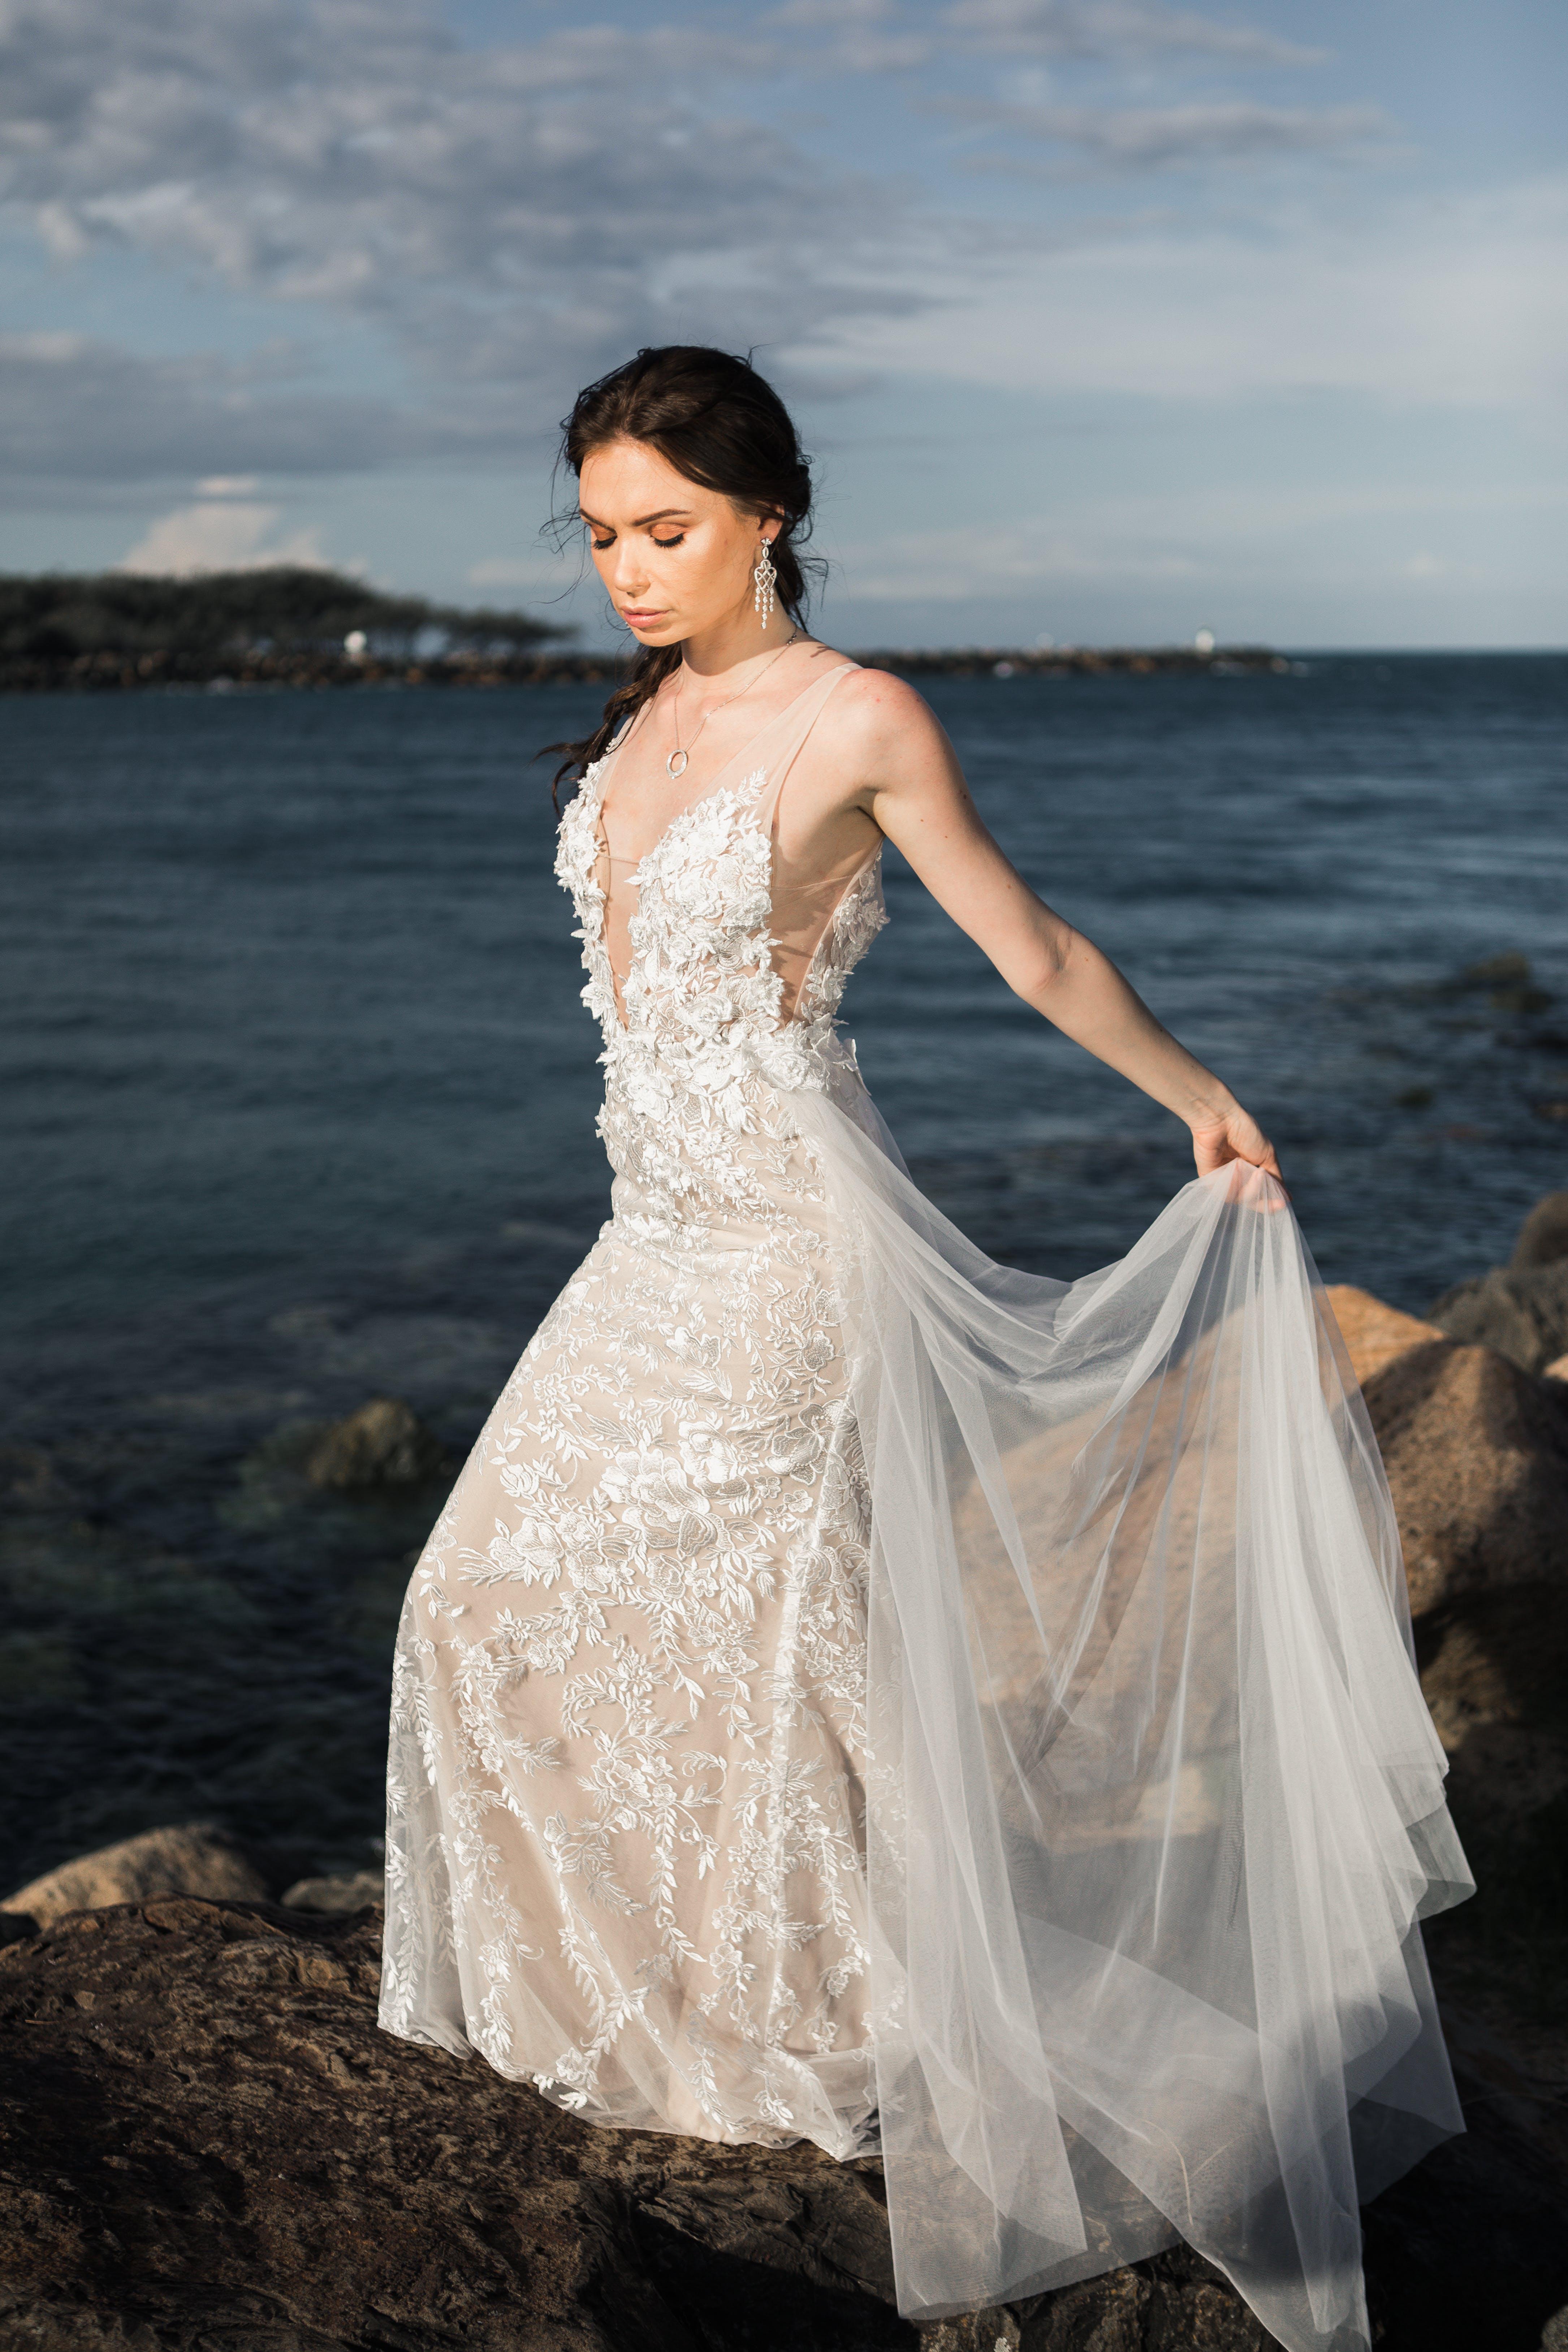 Woman Wearing White Floral Wedding Dress Standing On Rocks Near Body Of Water